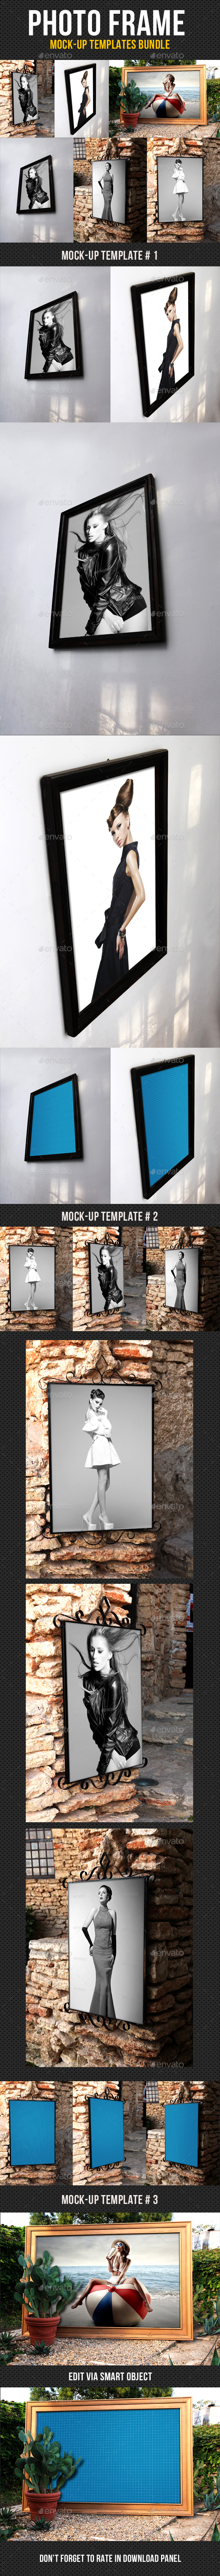 Photo Frame Mock-Up Bundle - Miscellaneous Product Mock-Ups